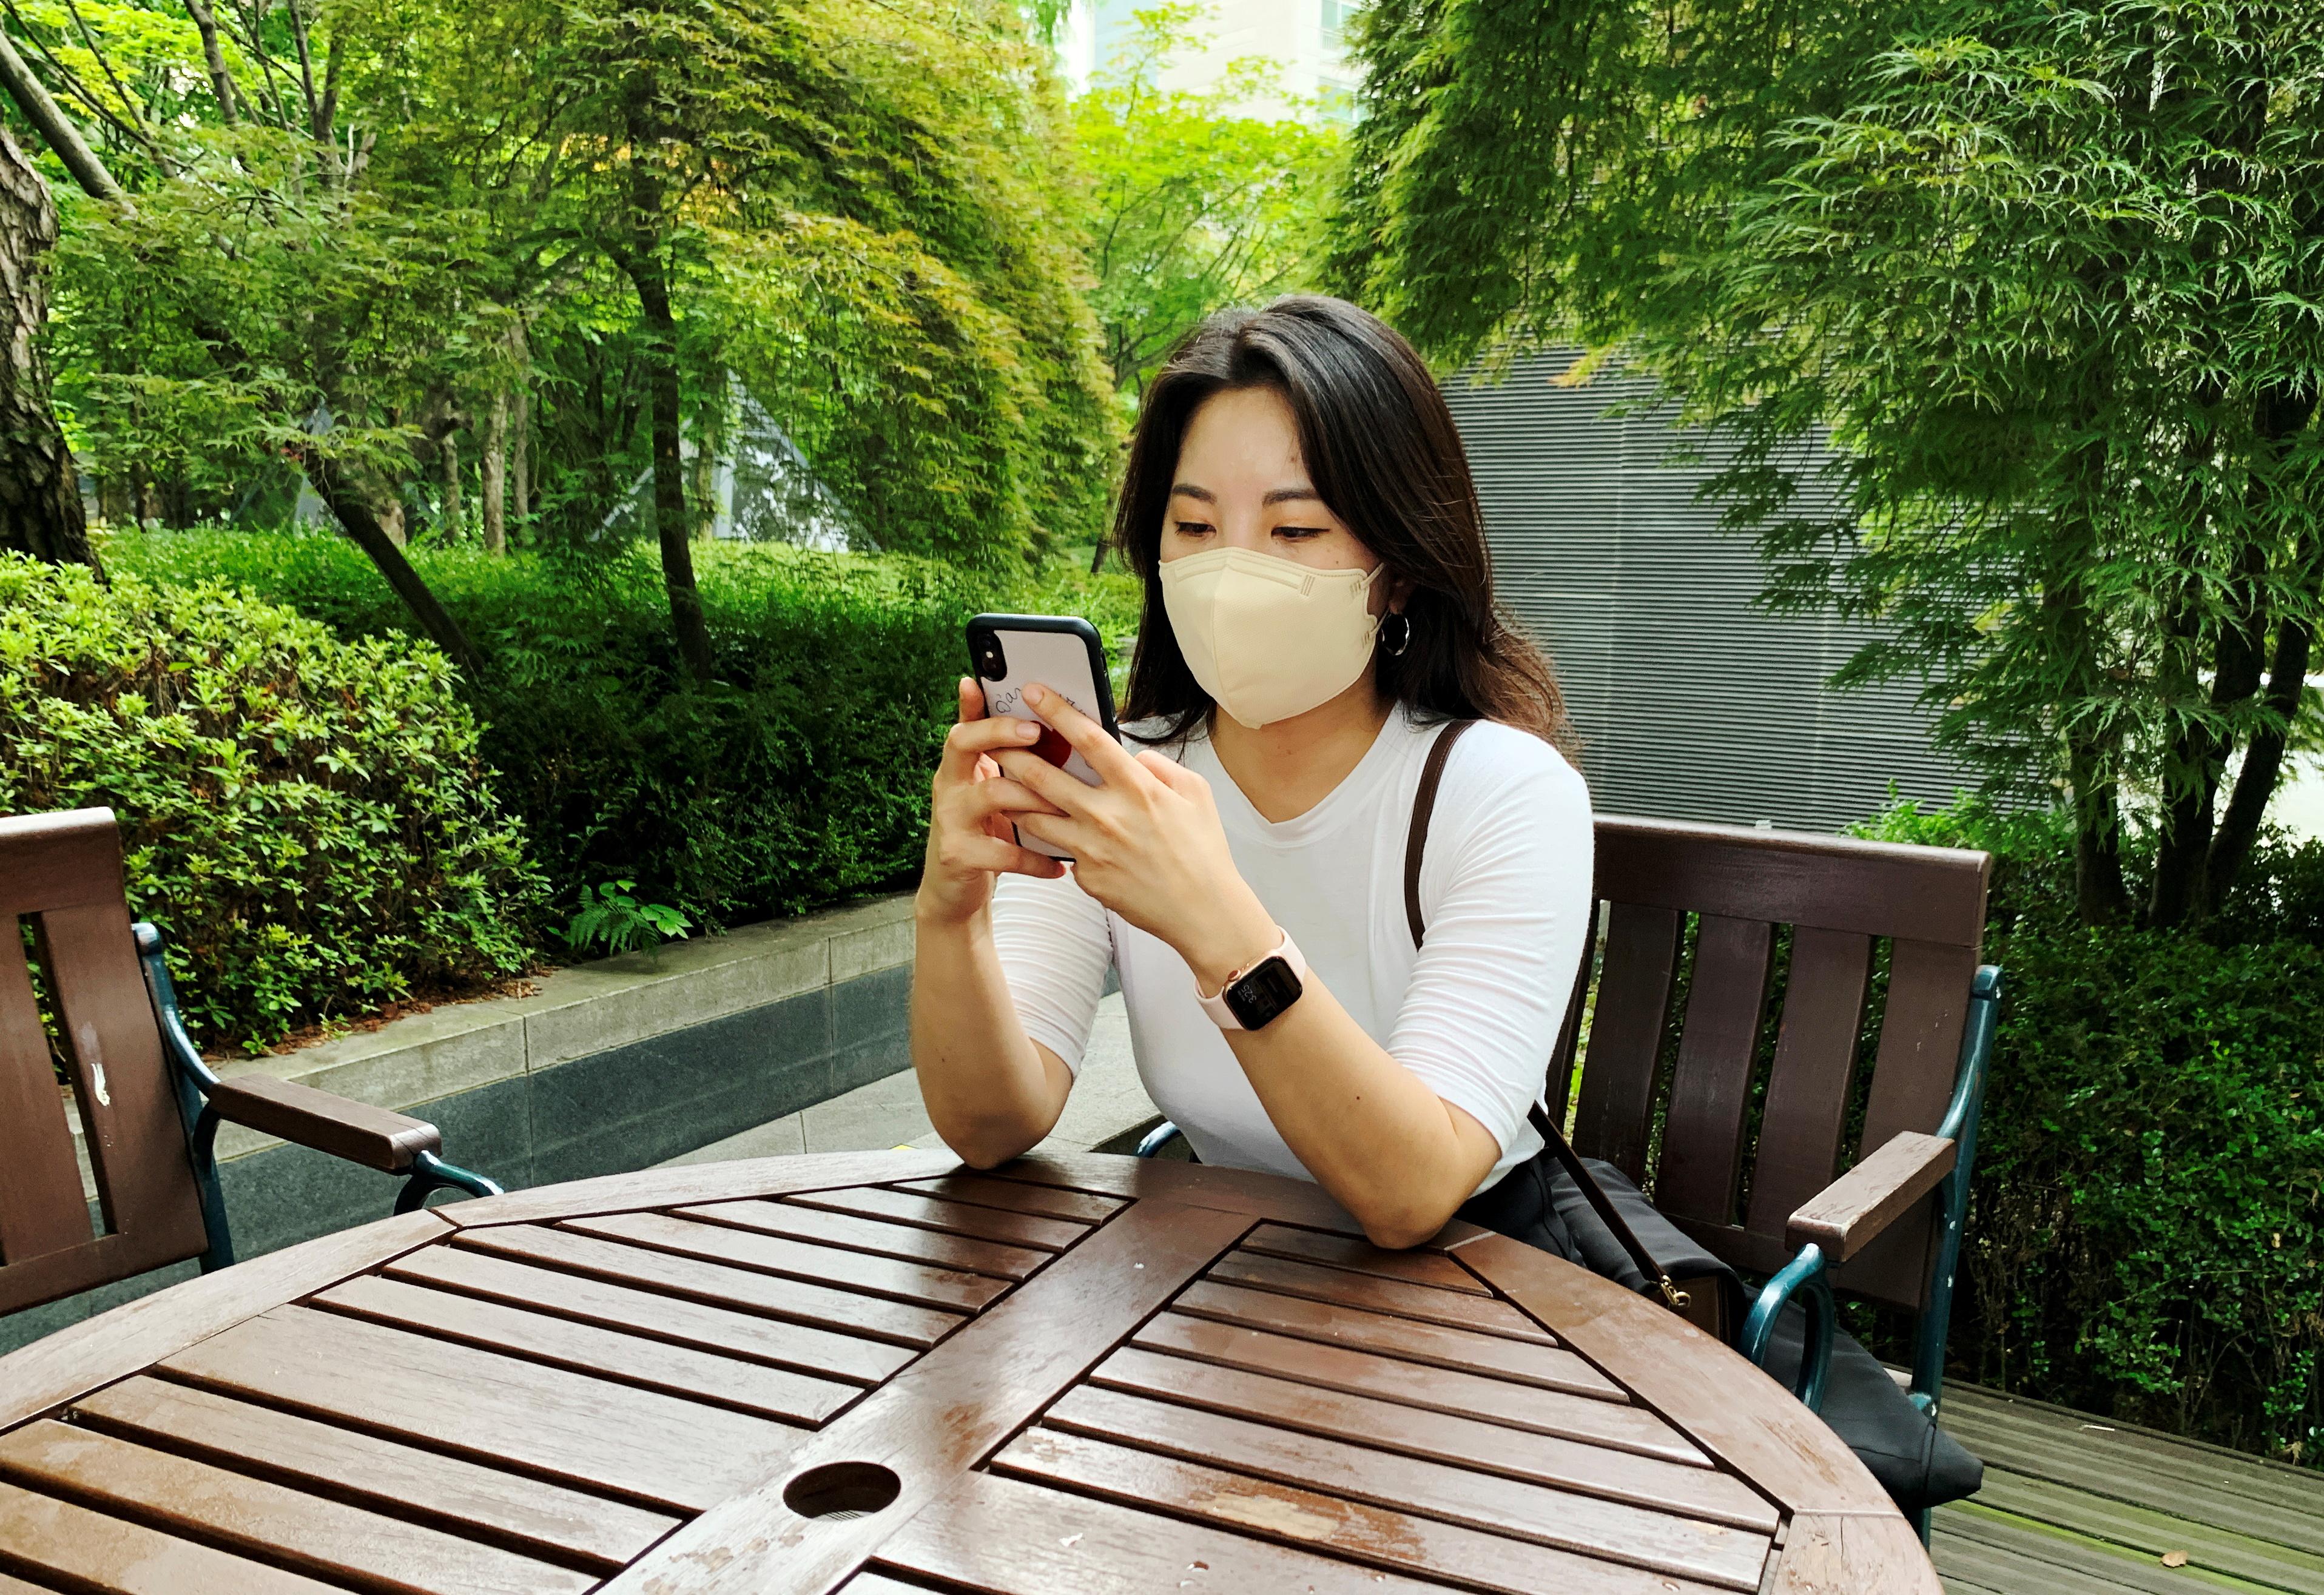 32-year-old graduate student Kim Hyun-jin tries to book a coronavirus disease (COVID-19) vaccination via online in Seoul, South Korea, July 15, 2021. REUTERS/Minwoo Park